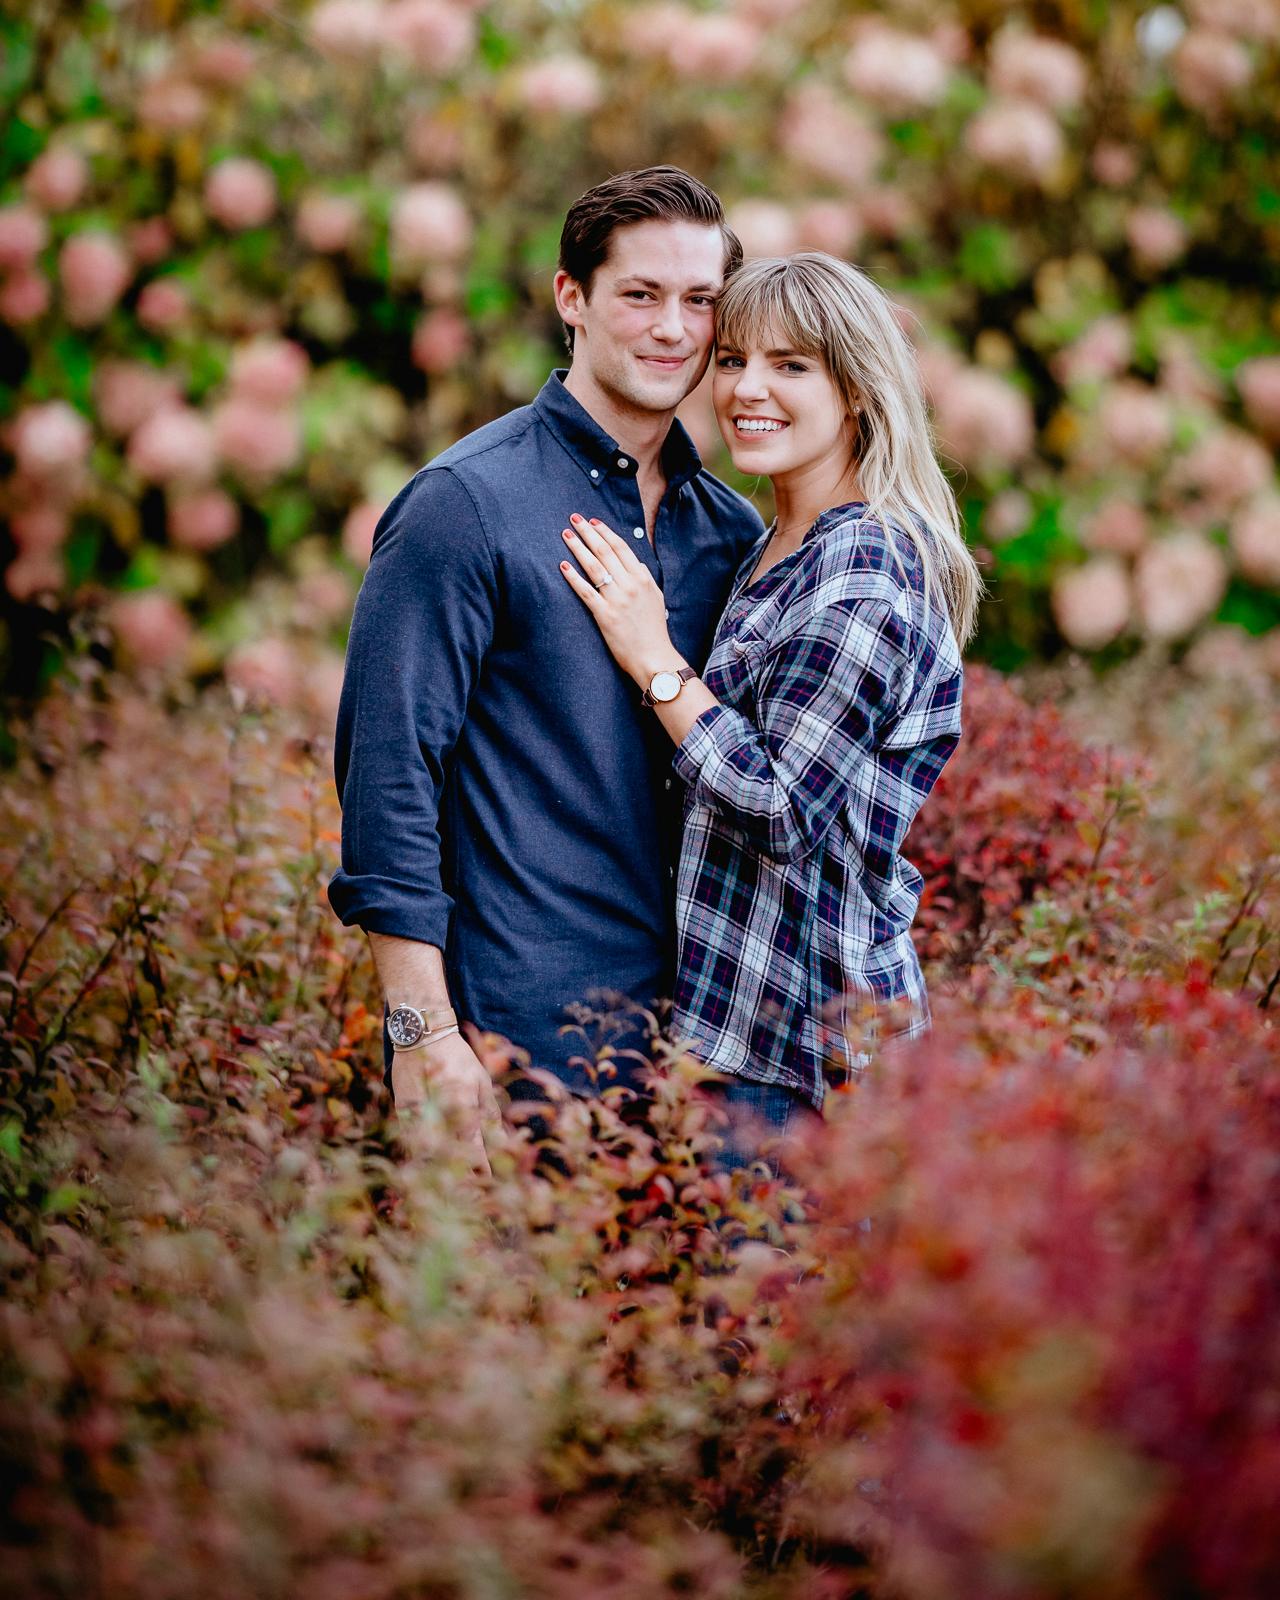 Hudson Valley proposal surprise engagement